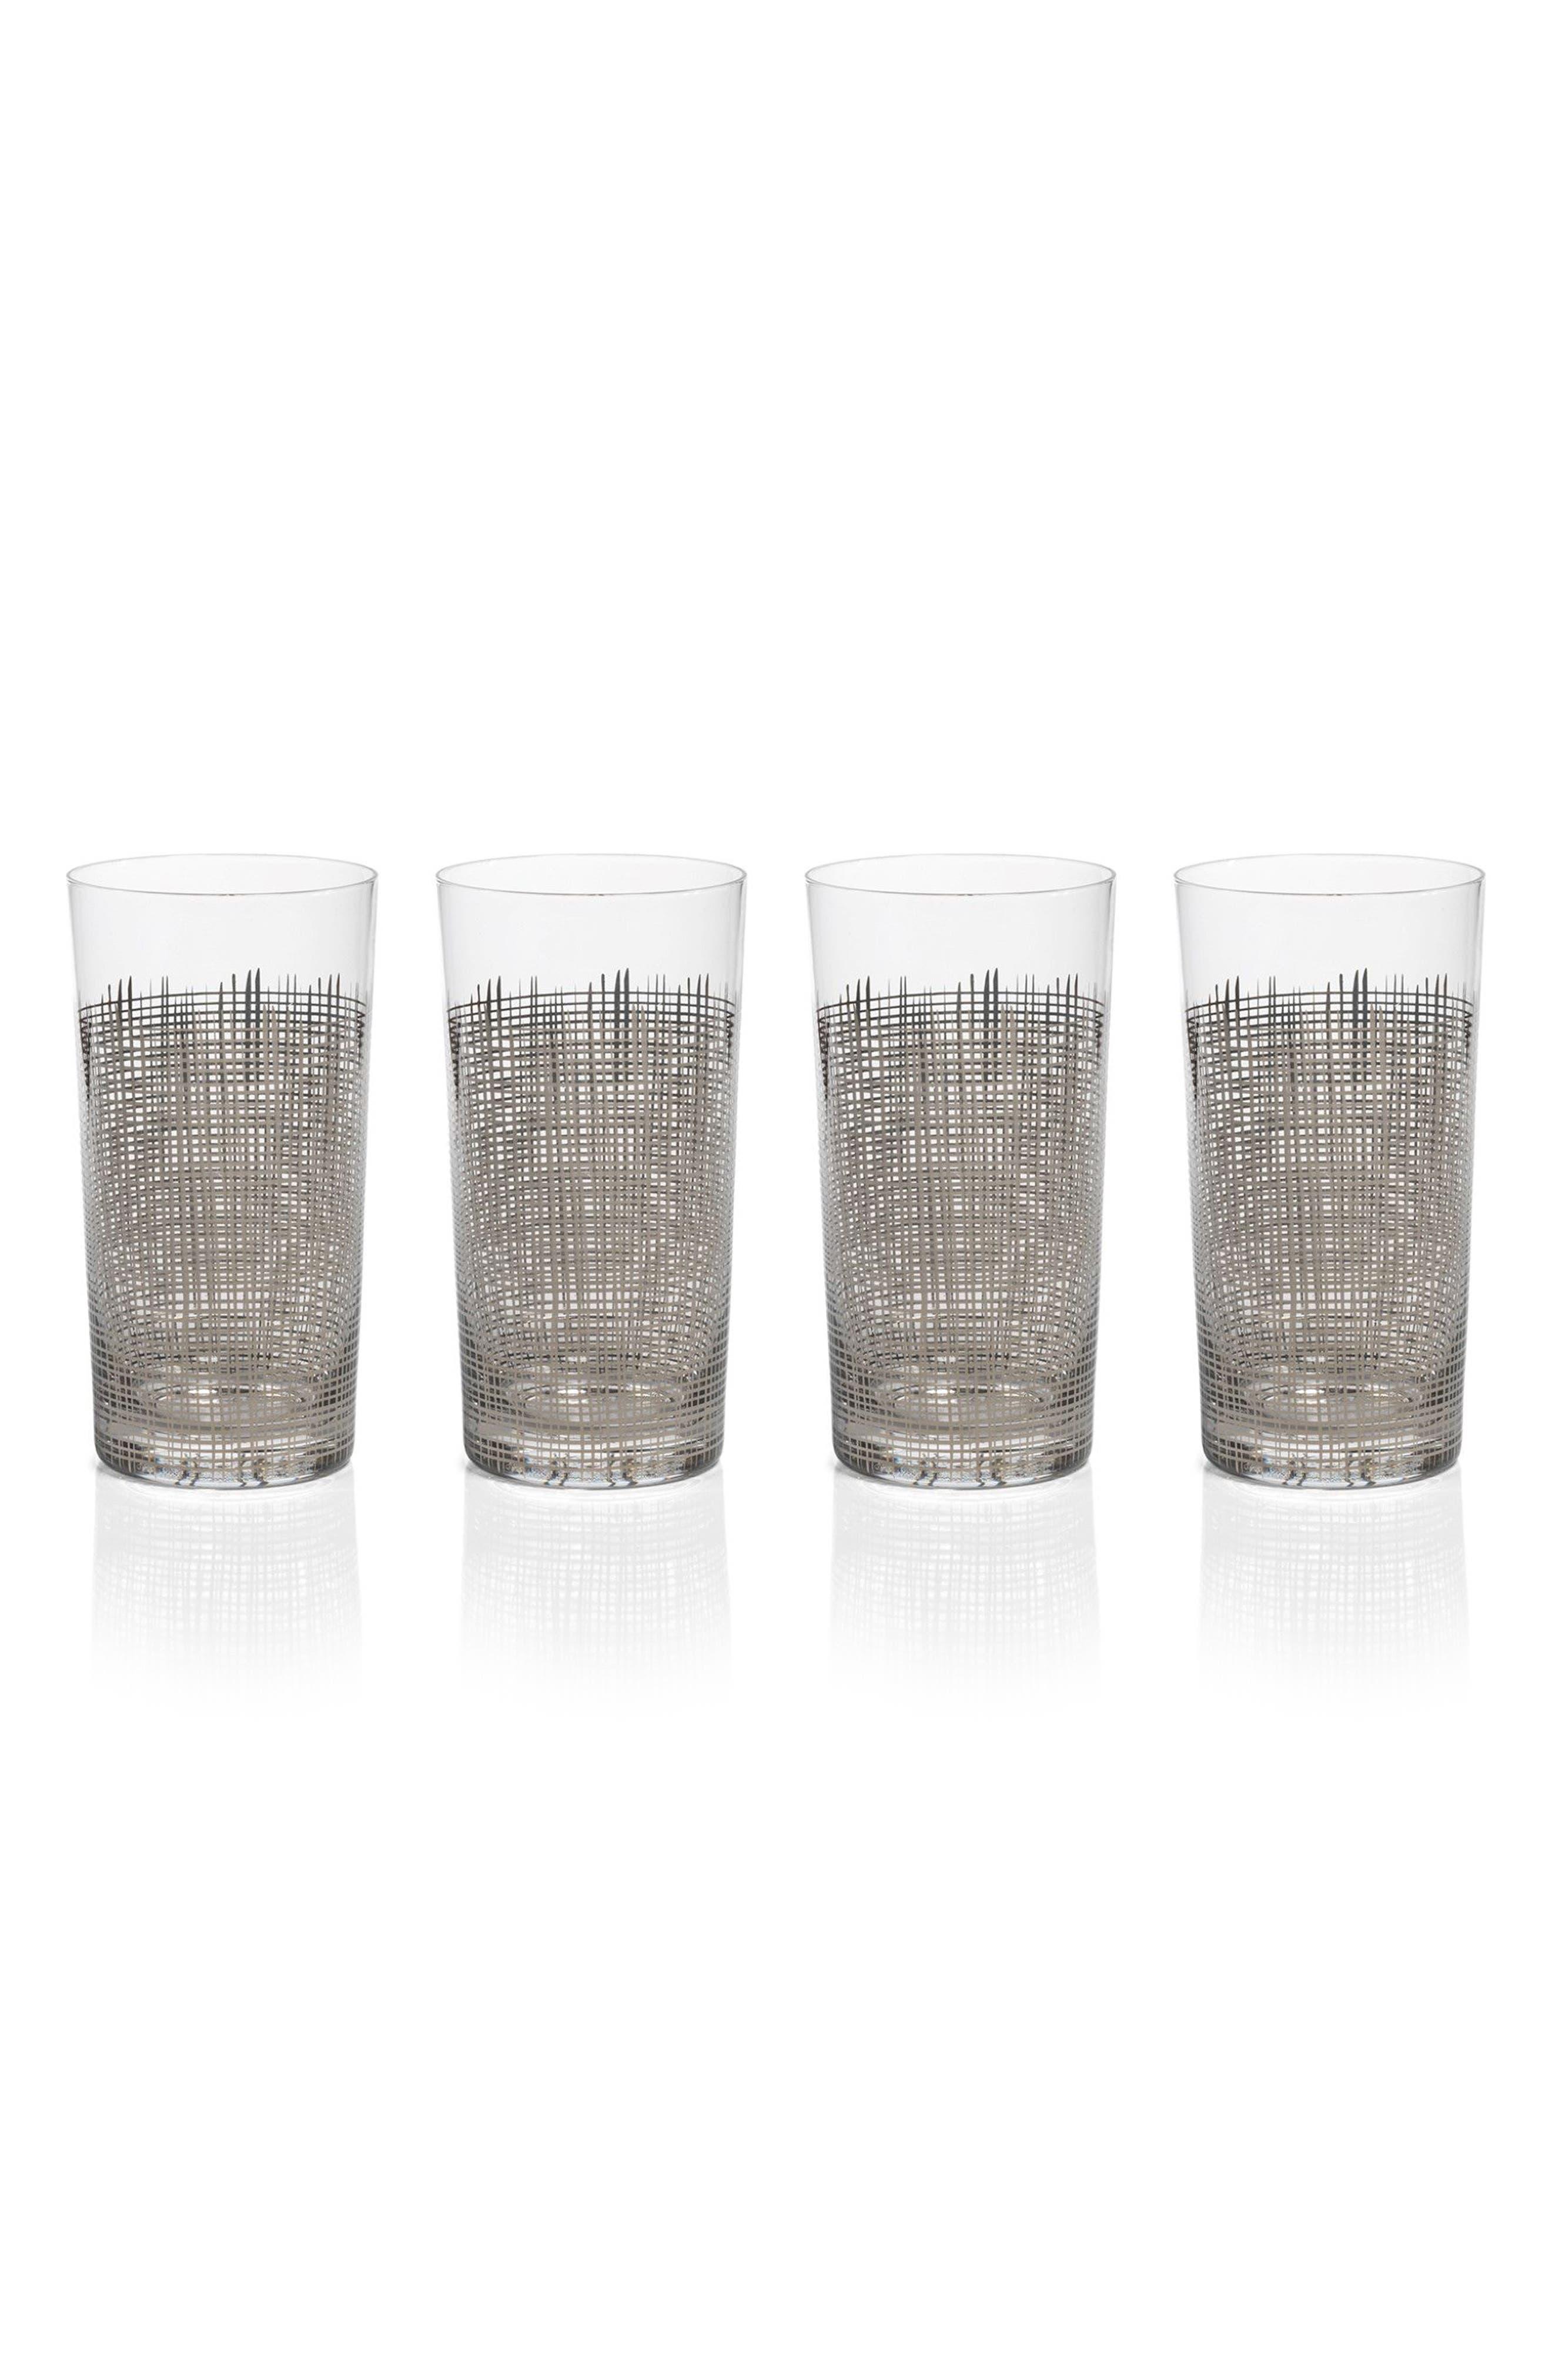 Reza Set of 4 Highball Glasses,                             Main thumbnail 1, color,                             040